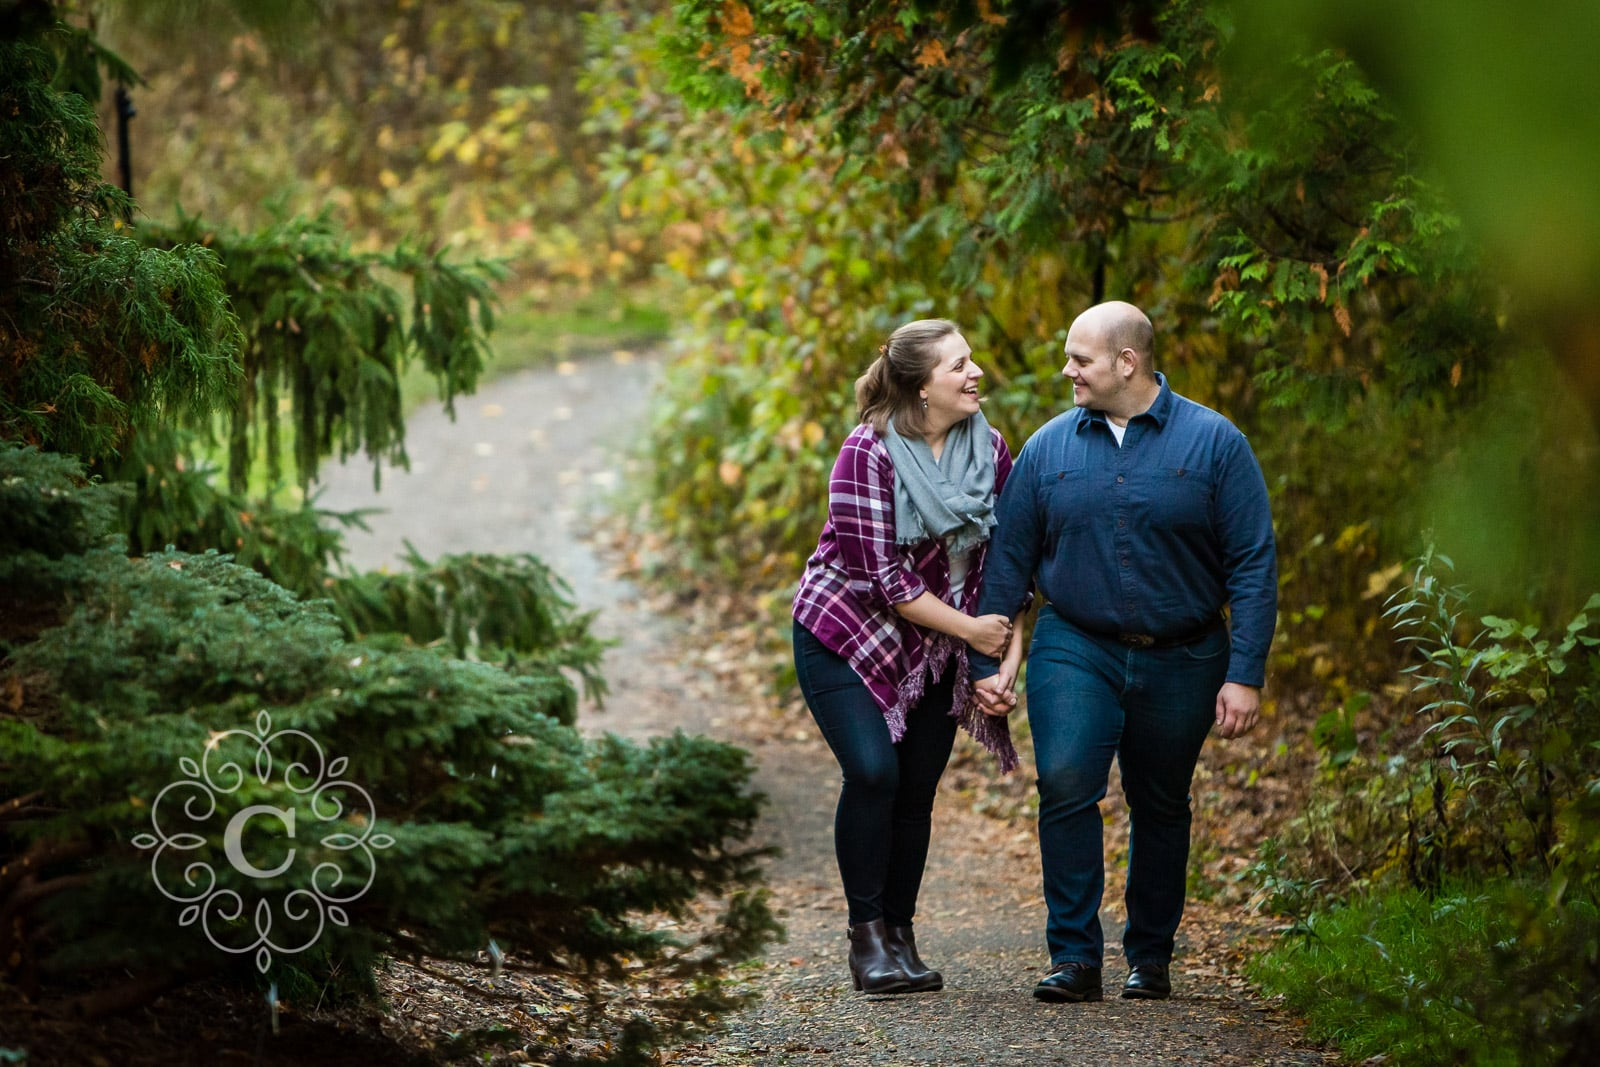 MN Landscape Arboretum Fall Engagement Photo